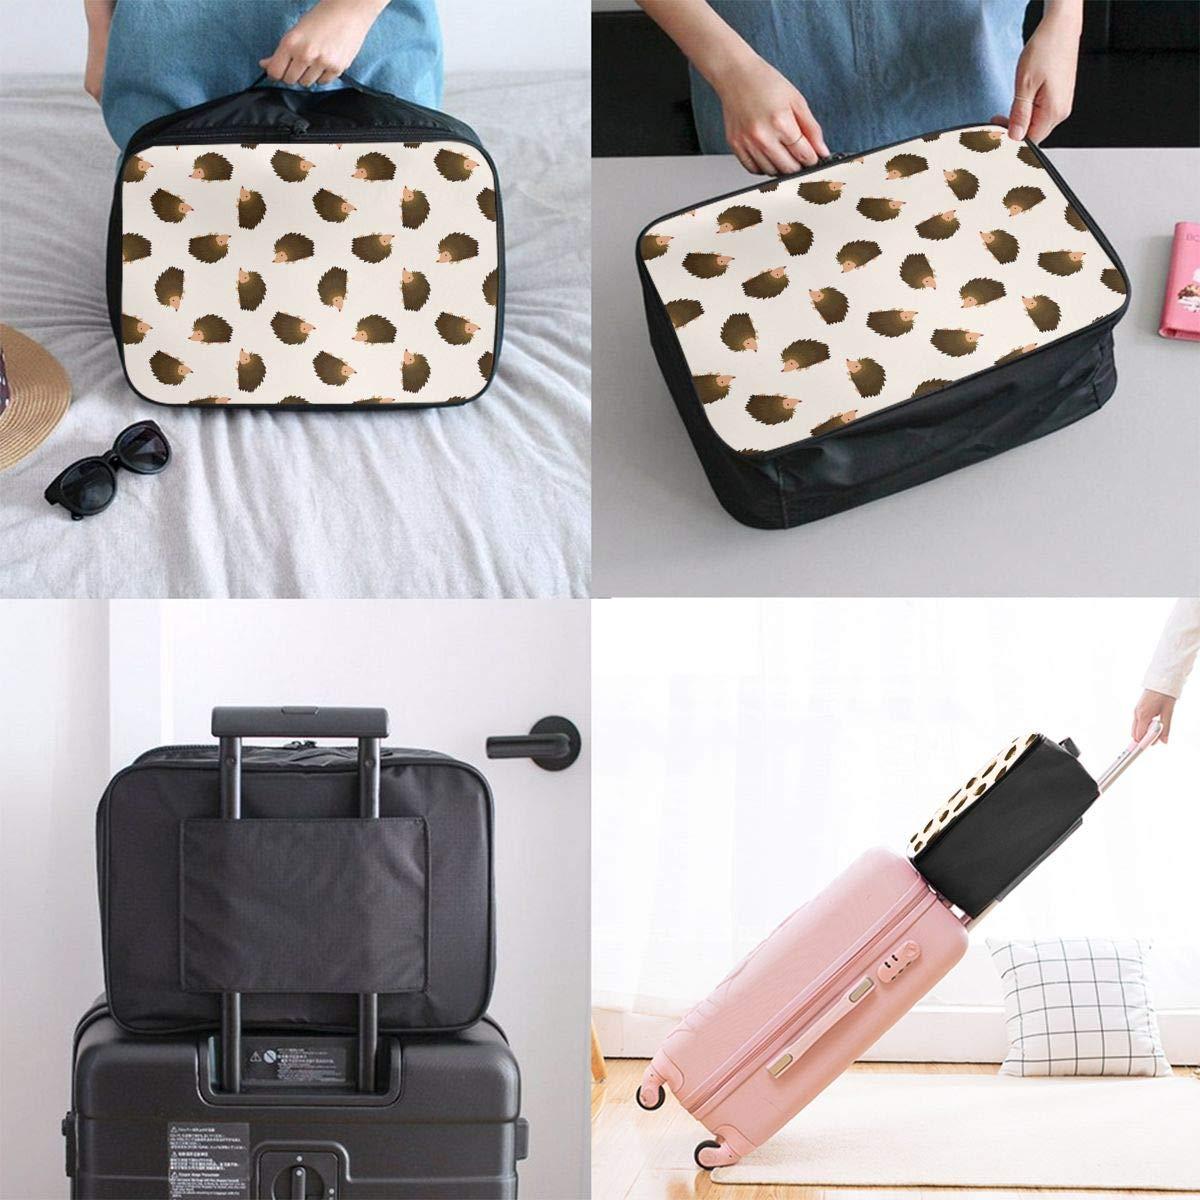 Travel Luggage Duffle Bag Lightweight Portable Handbag Hedgehog Pattern Large Capacity Waterproof Foldable Storage Tote